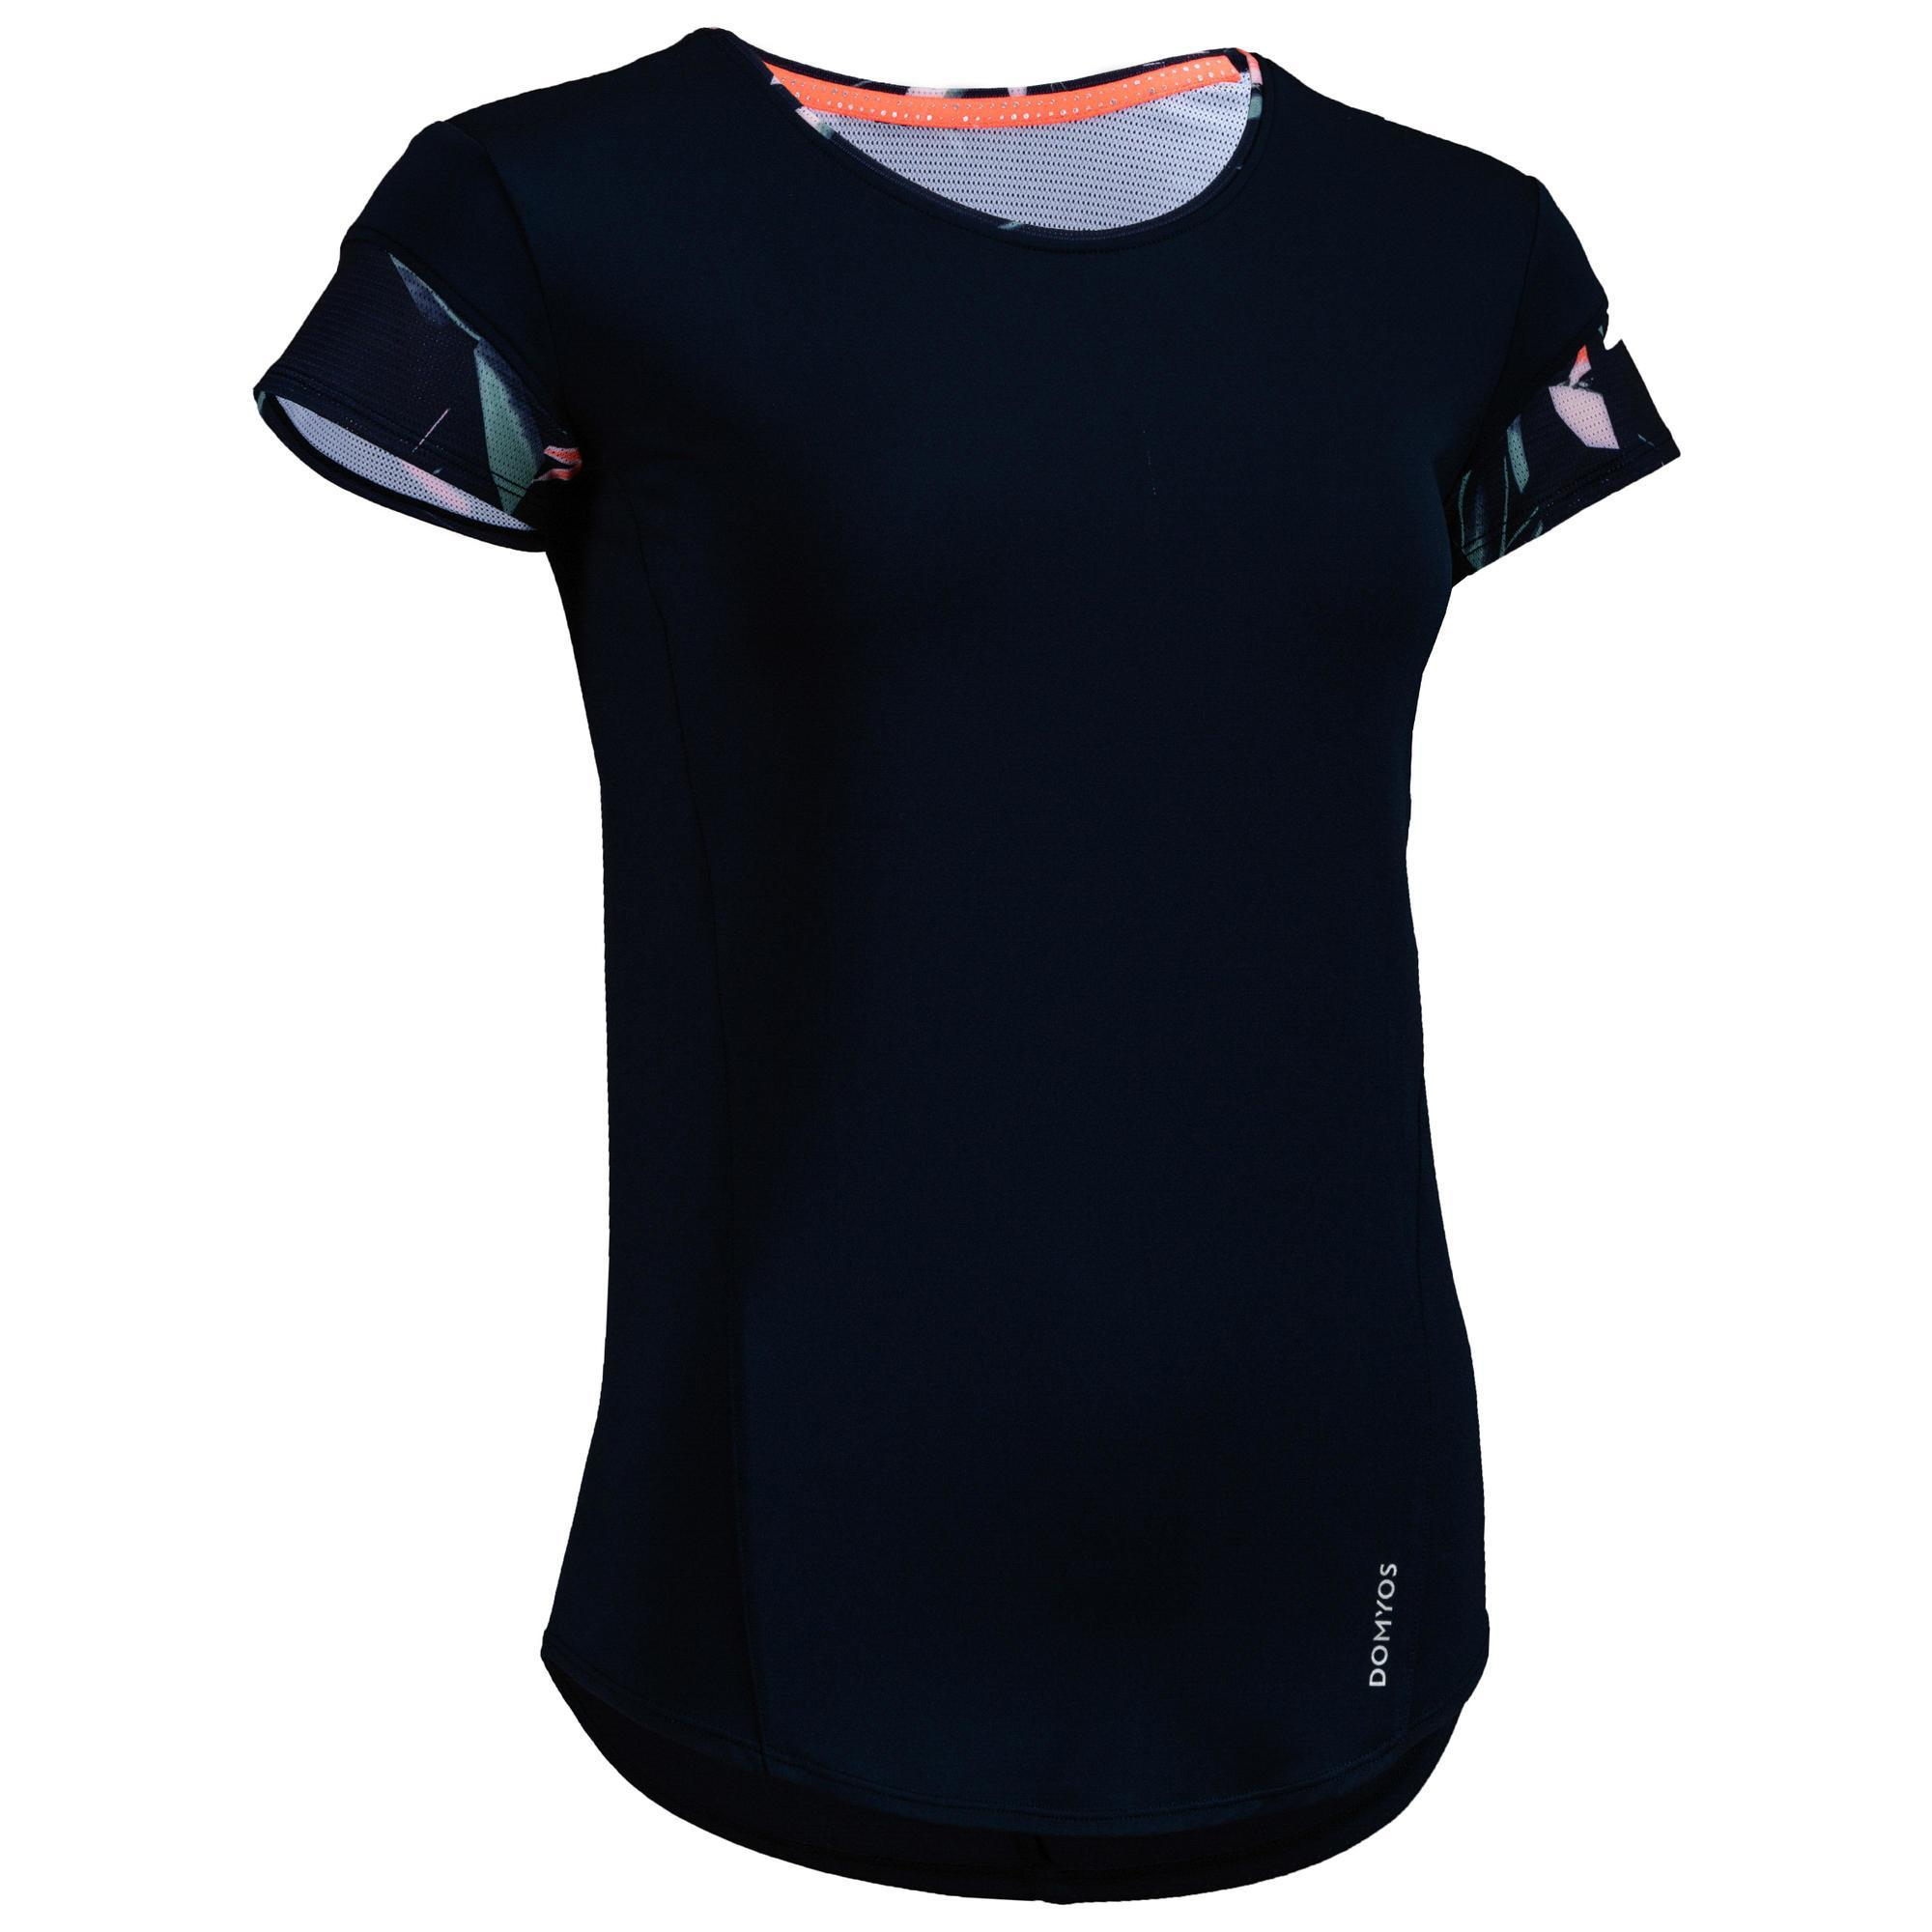 Domyos Fitness T-shirt Energy + dames, voor cardiotraining